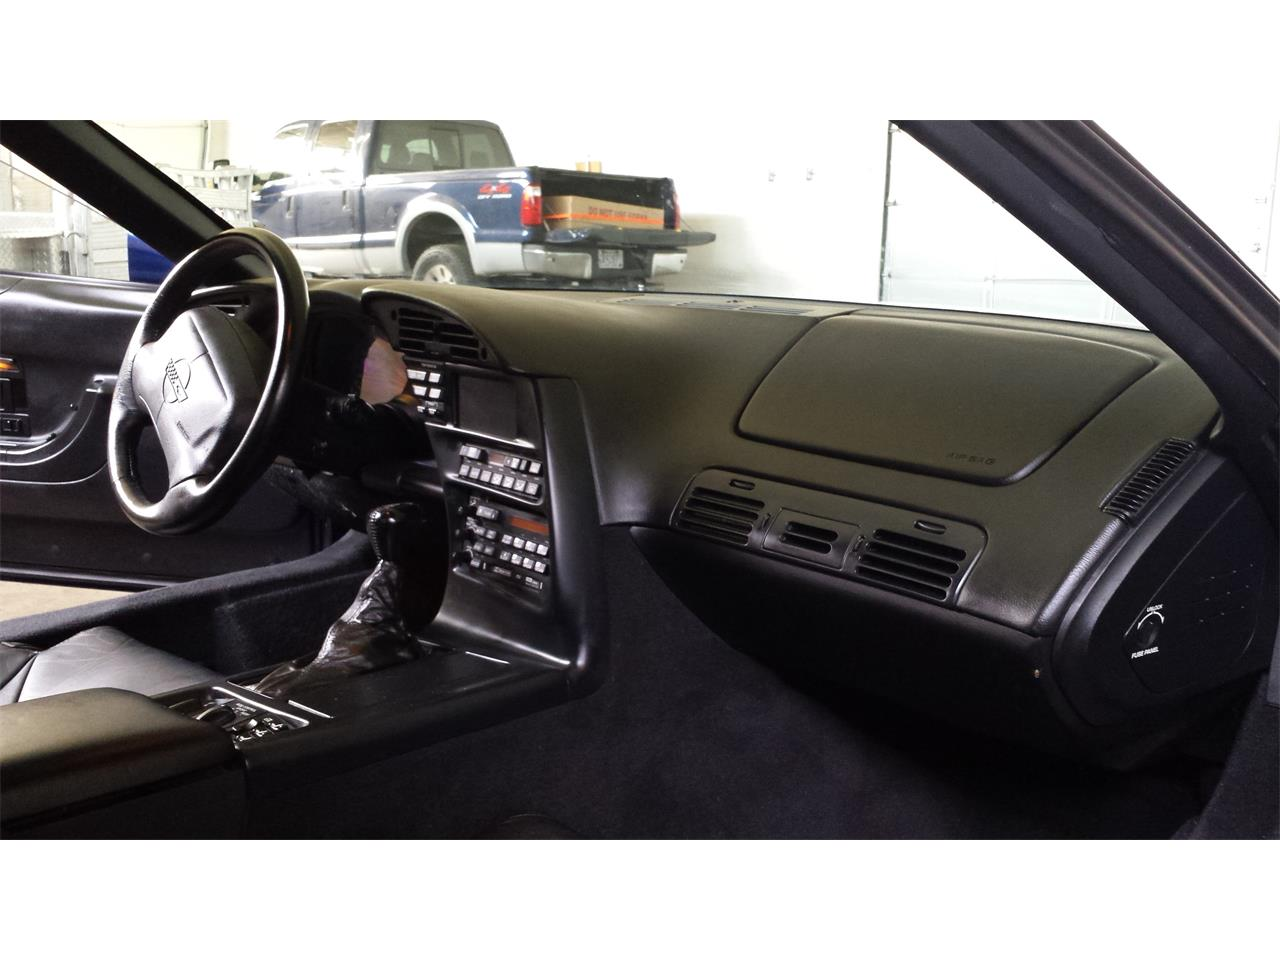 Large Picture of '96 Corvette located in Minneapolis Minnesota - $36,000.00 - MXIW